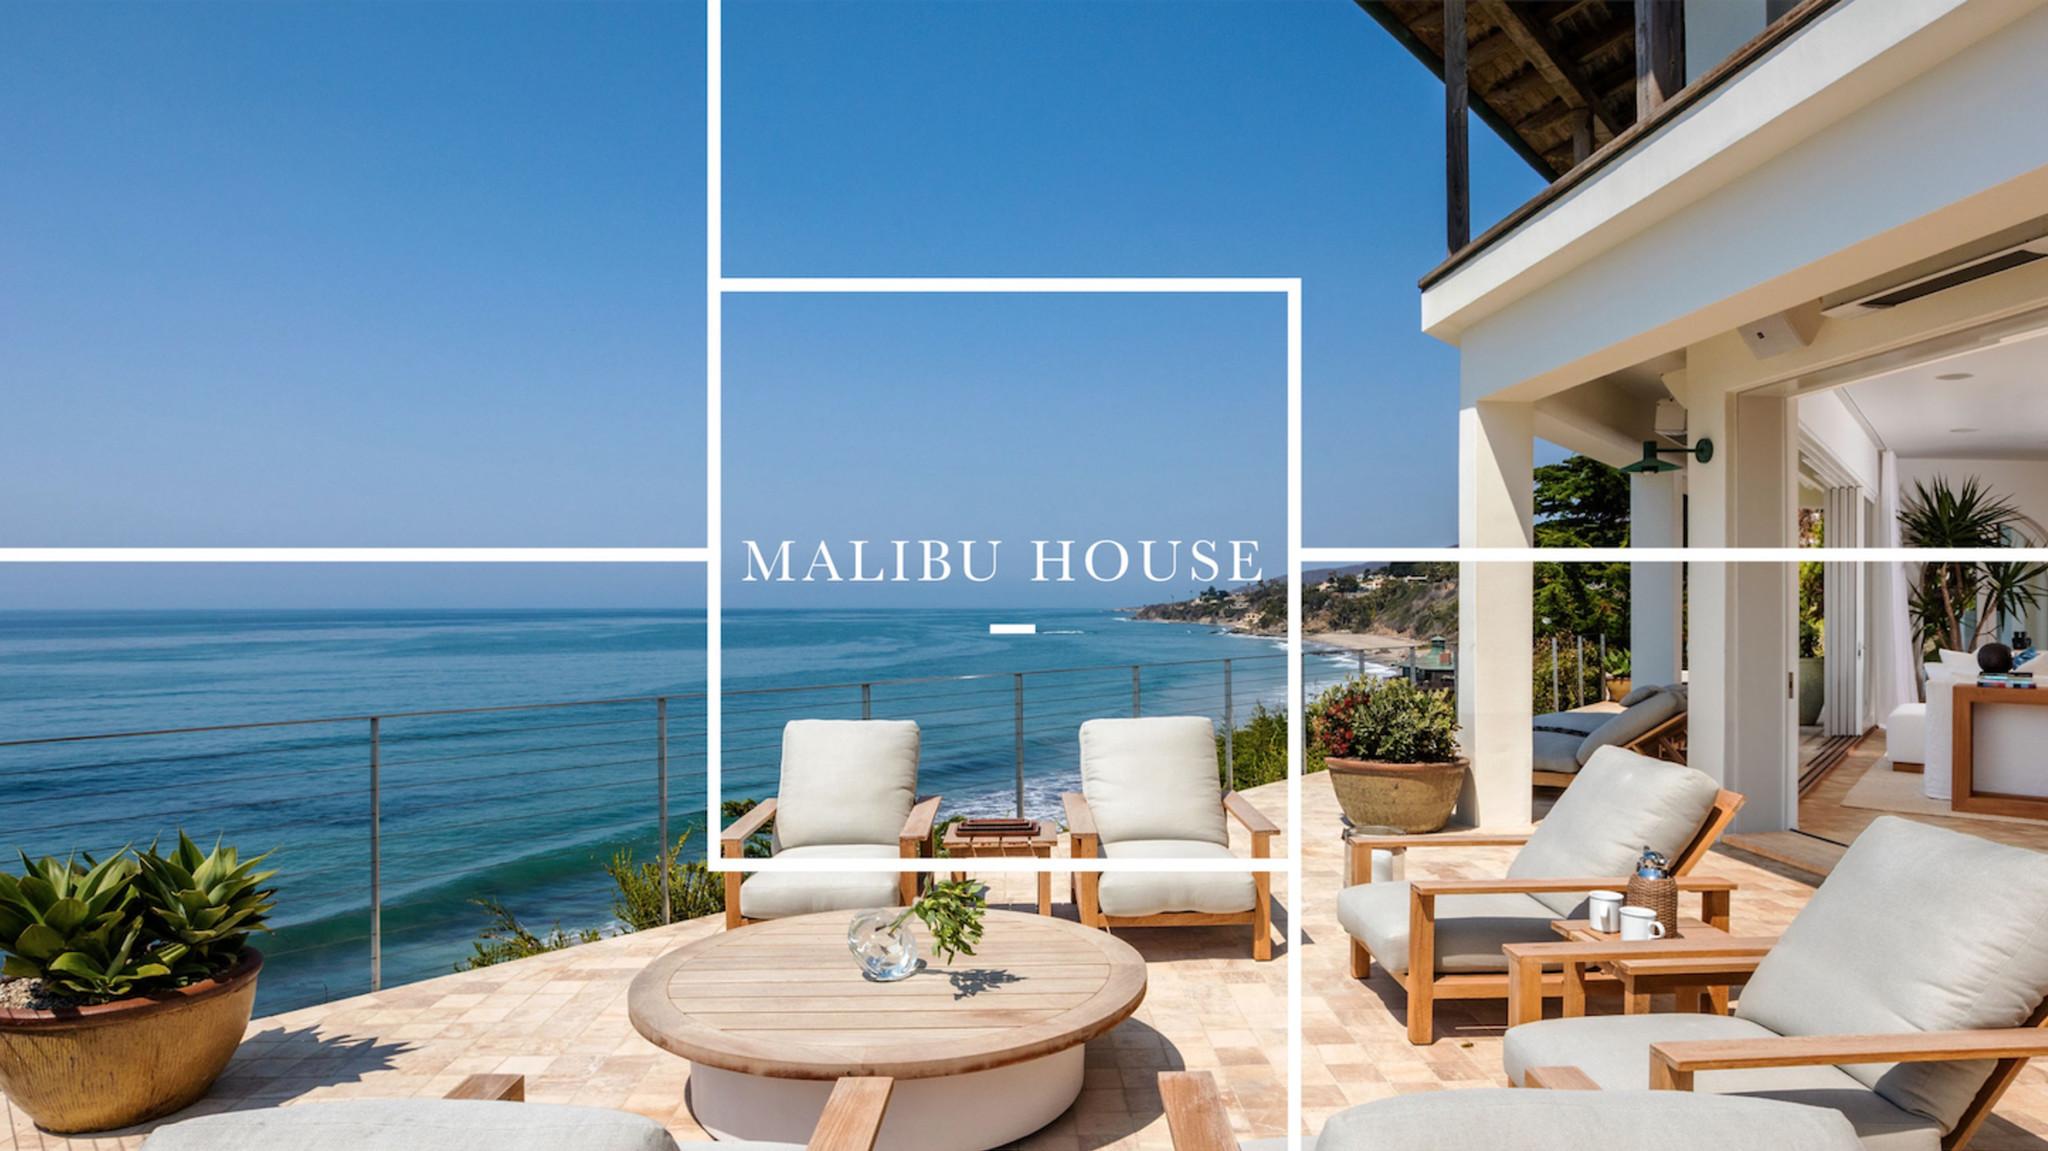 Cindy Crawford Home Cindy Crawford And Rande Gerber Seek 60 Million For Model Malibu